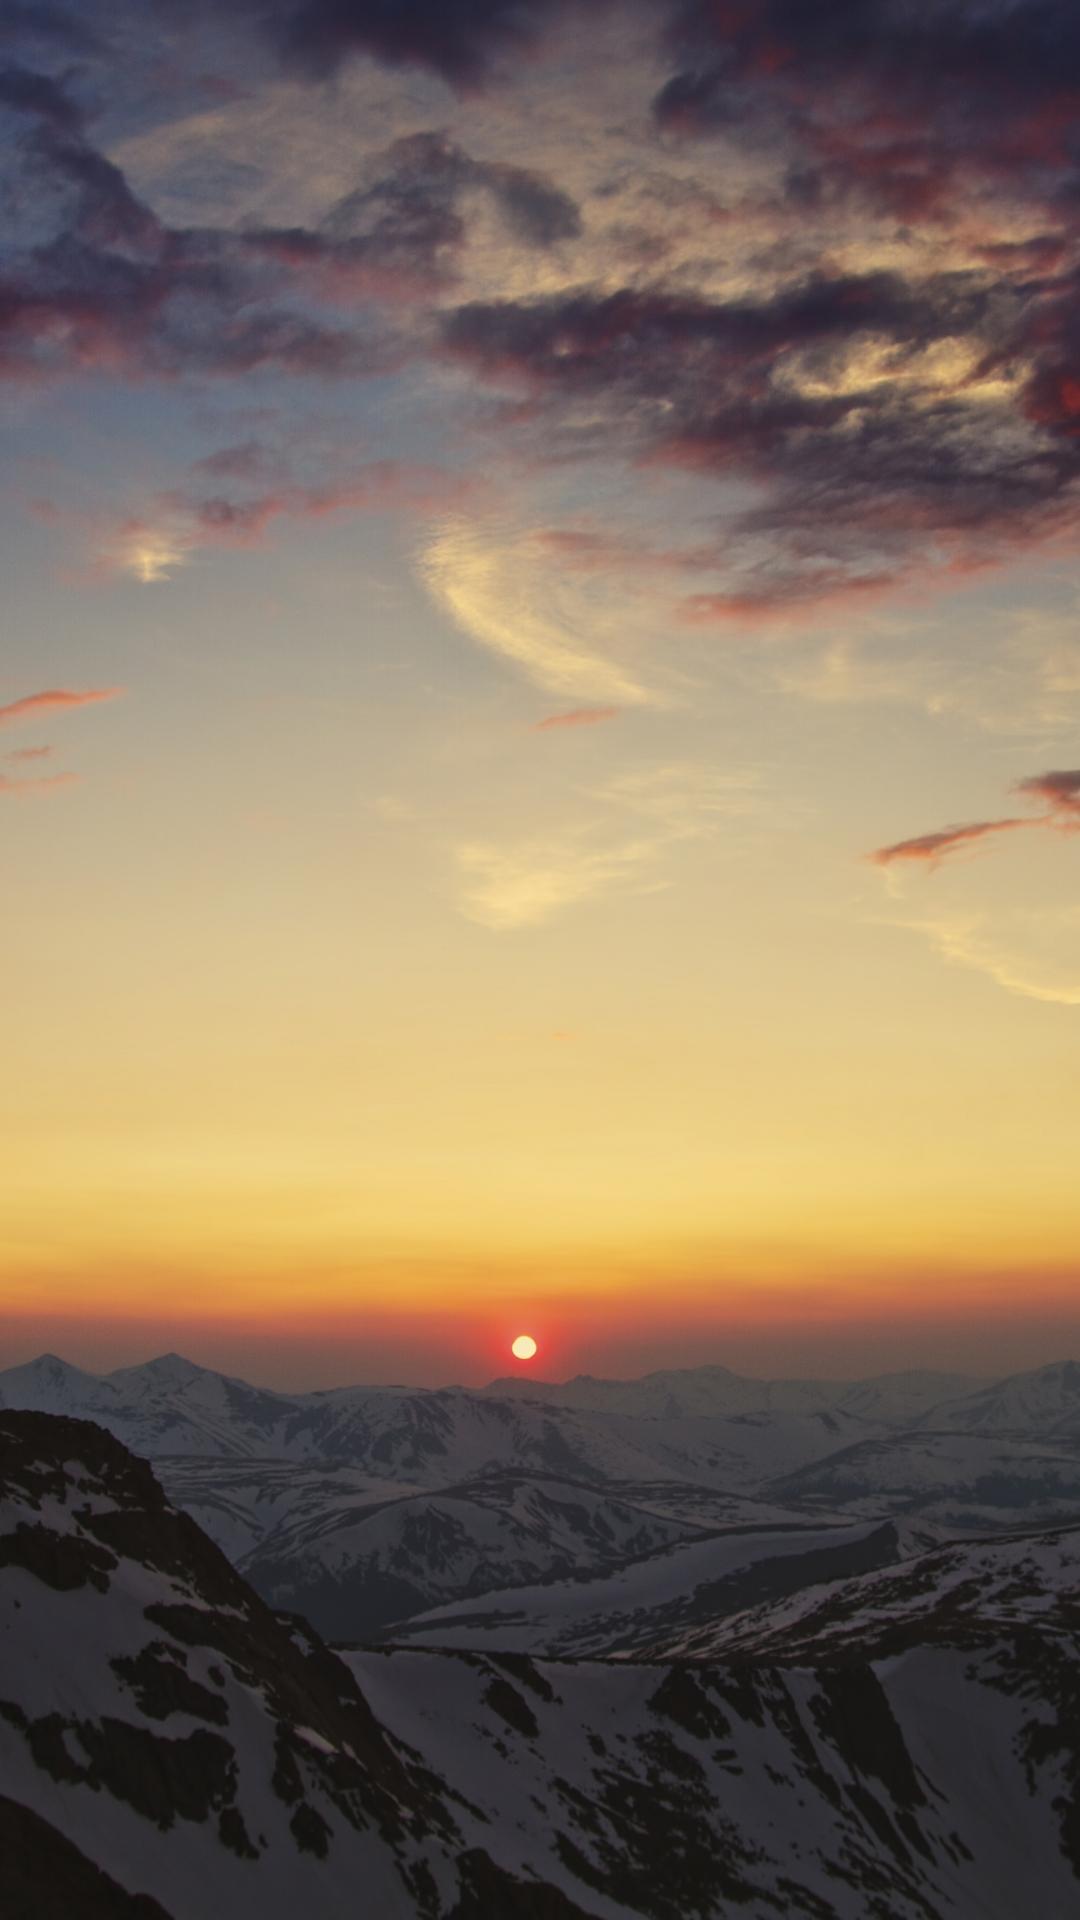 iphone wallpaper mountains cordillera Mountain Sunset